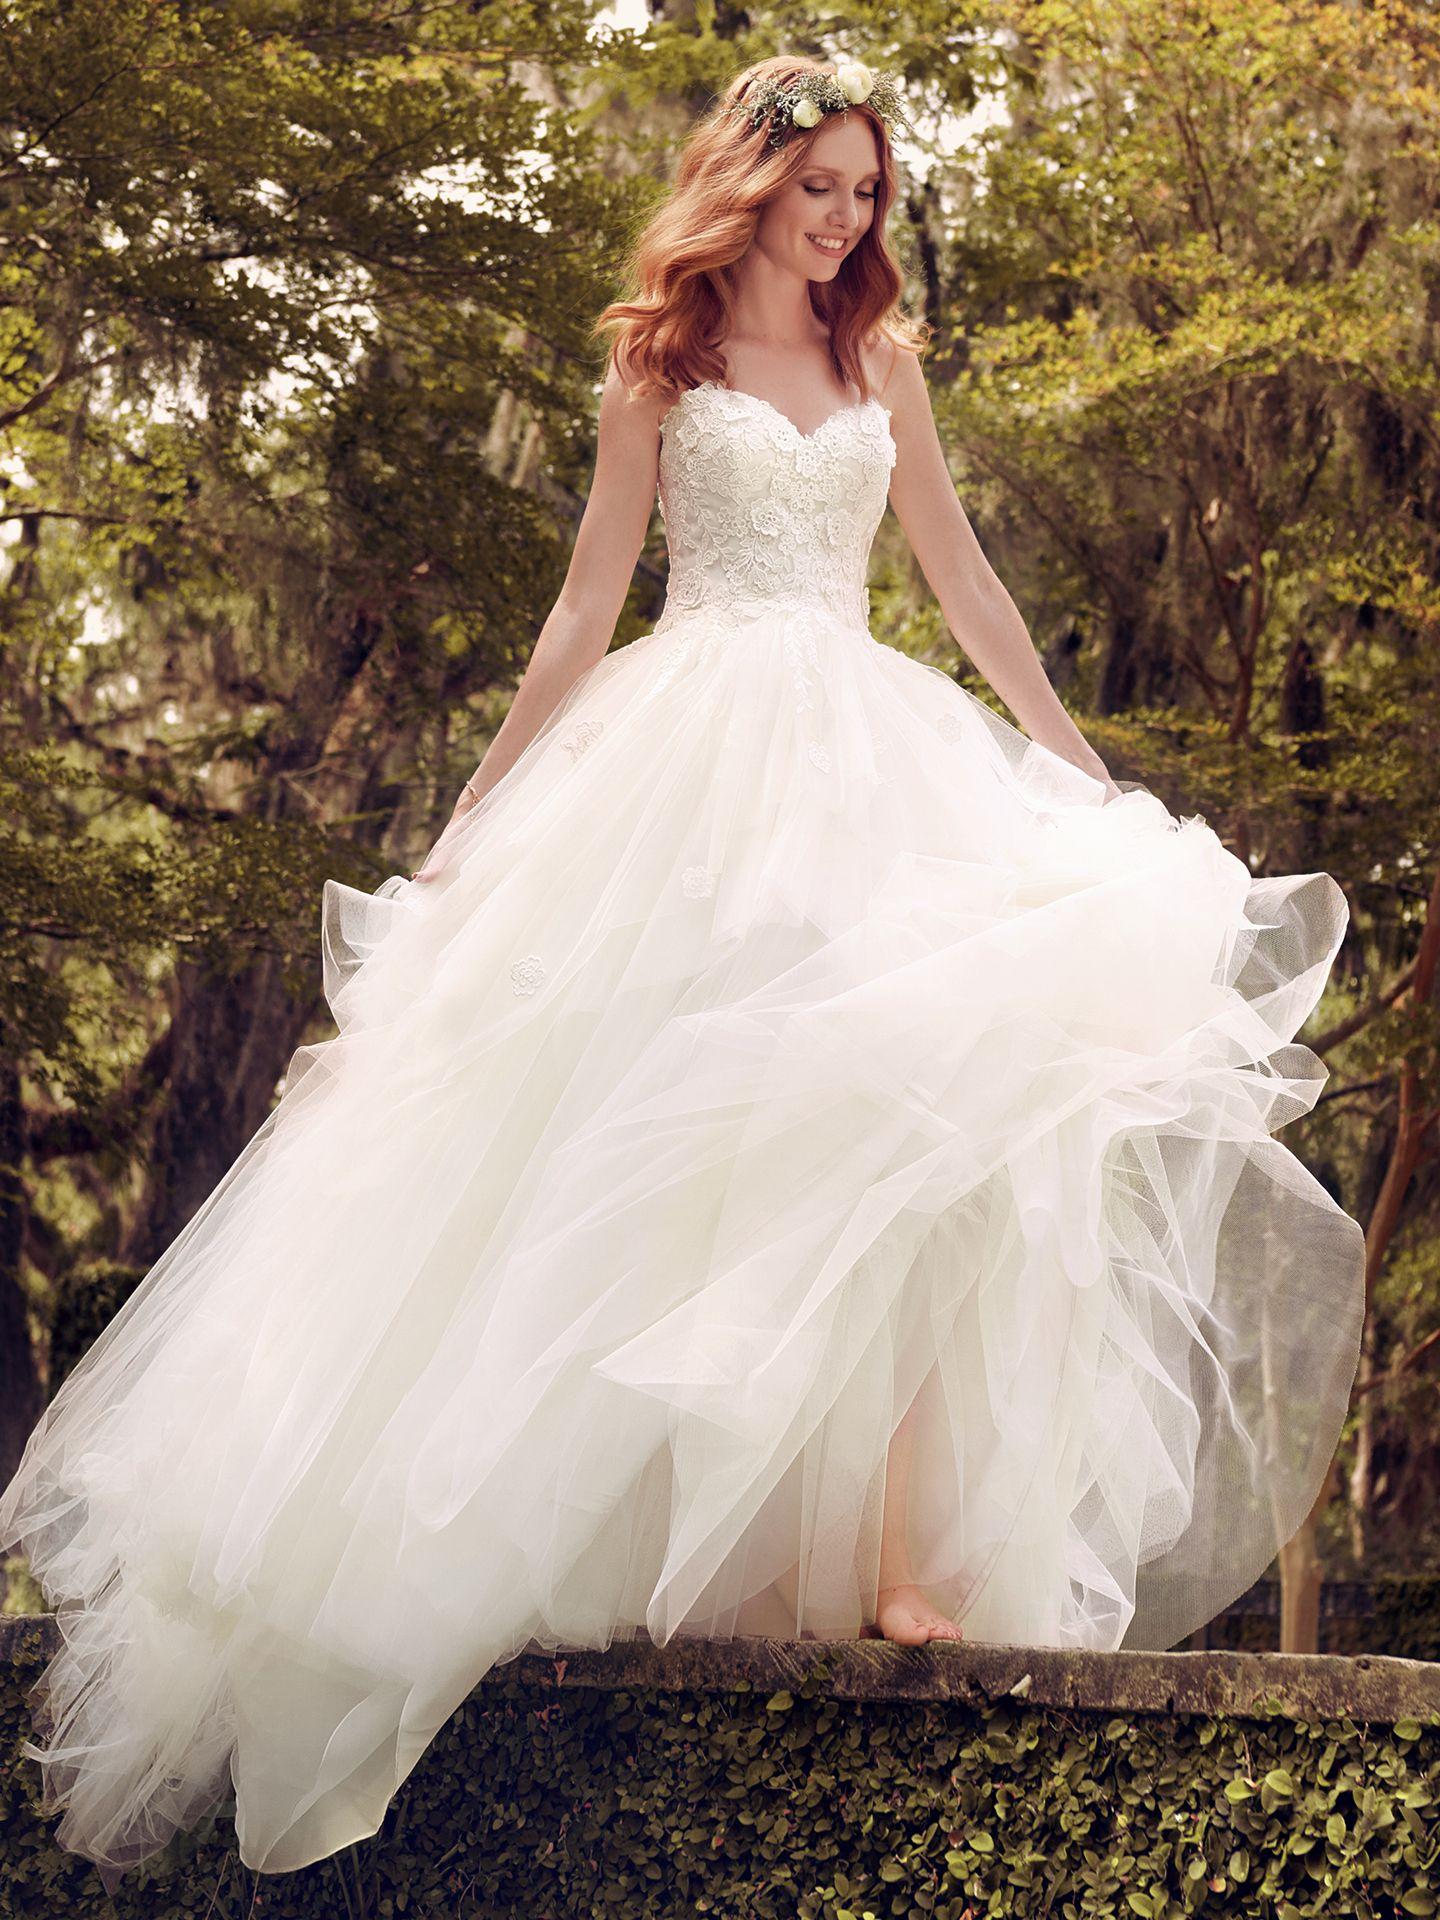 Maura Wedding Dress Bridal Gown | Maggie Sottero